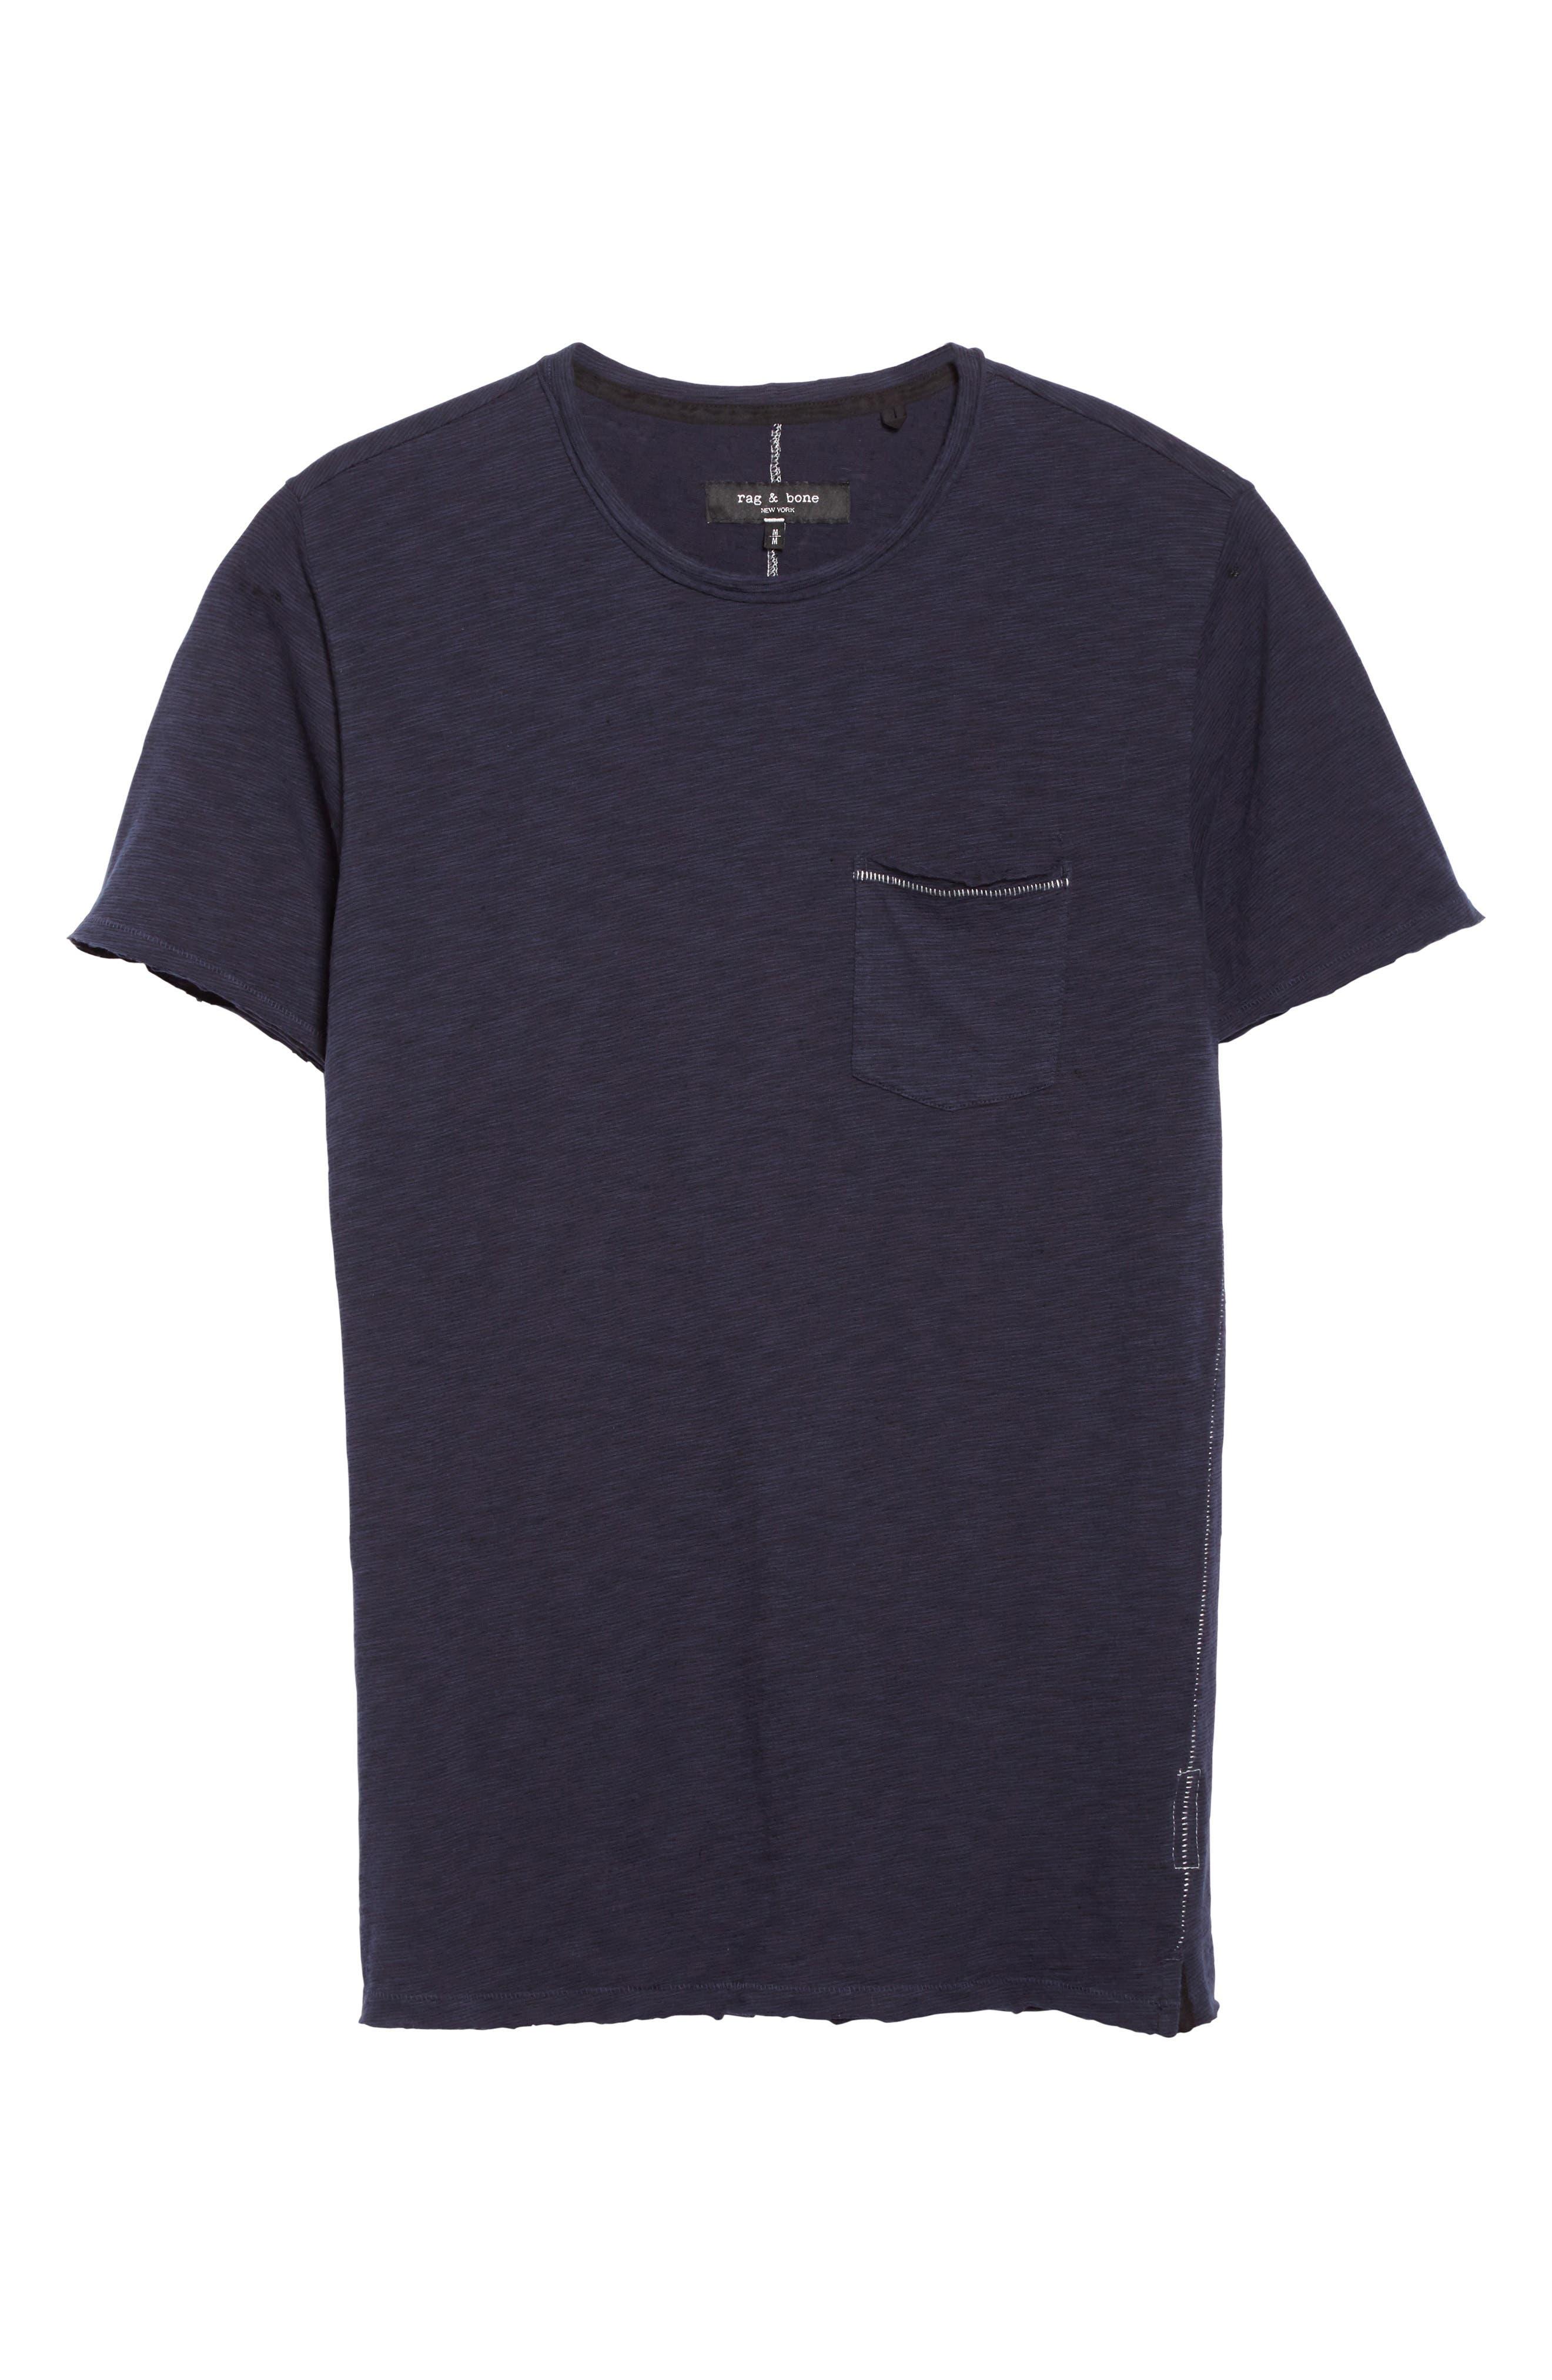 Owen Pocket T-Shirt,                             Alternate thumbnail 6, color,                             410